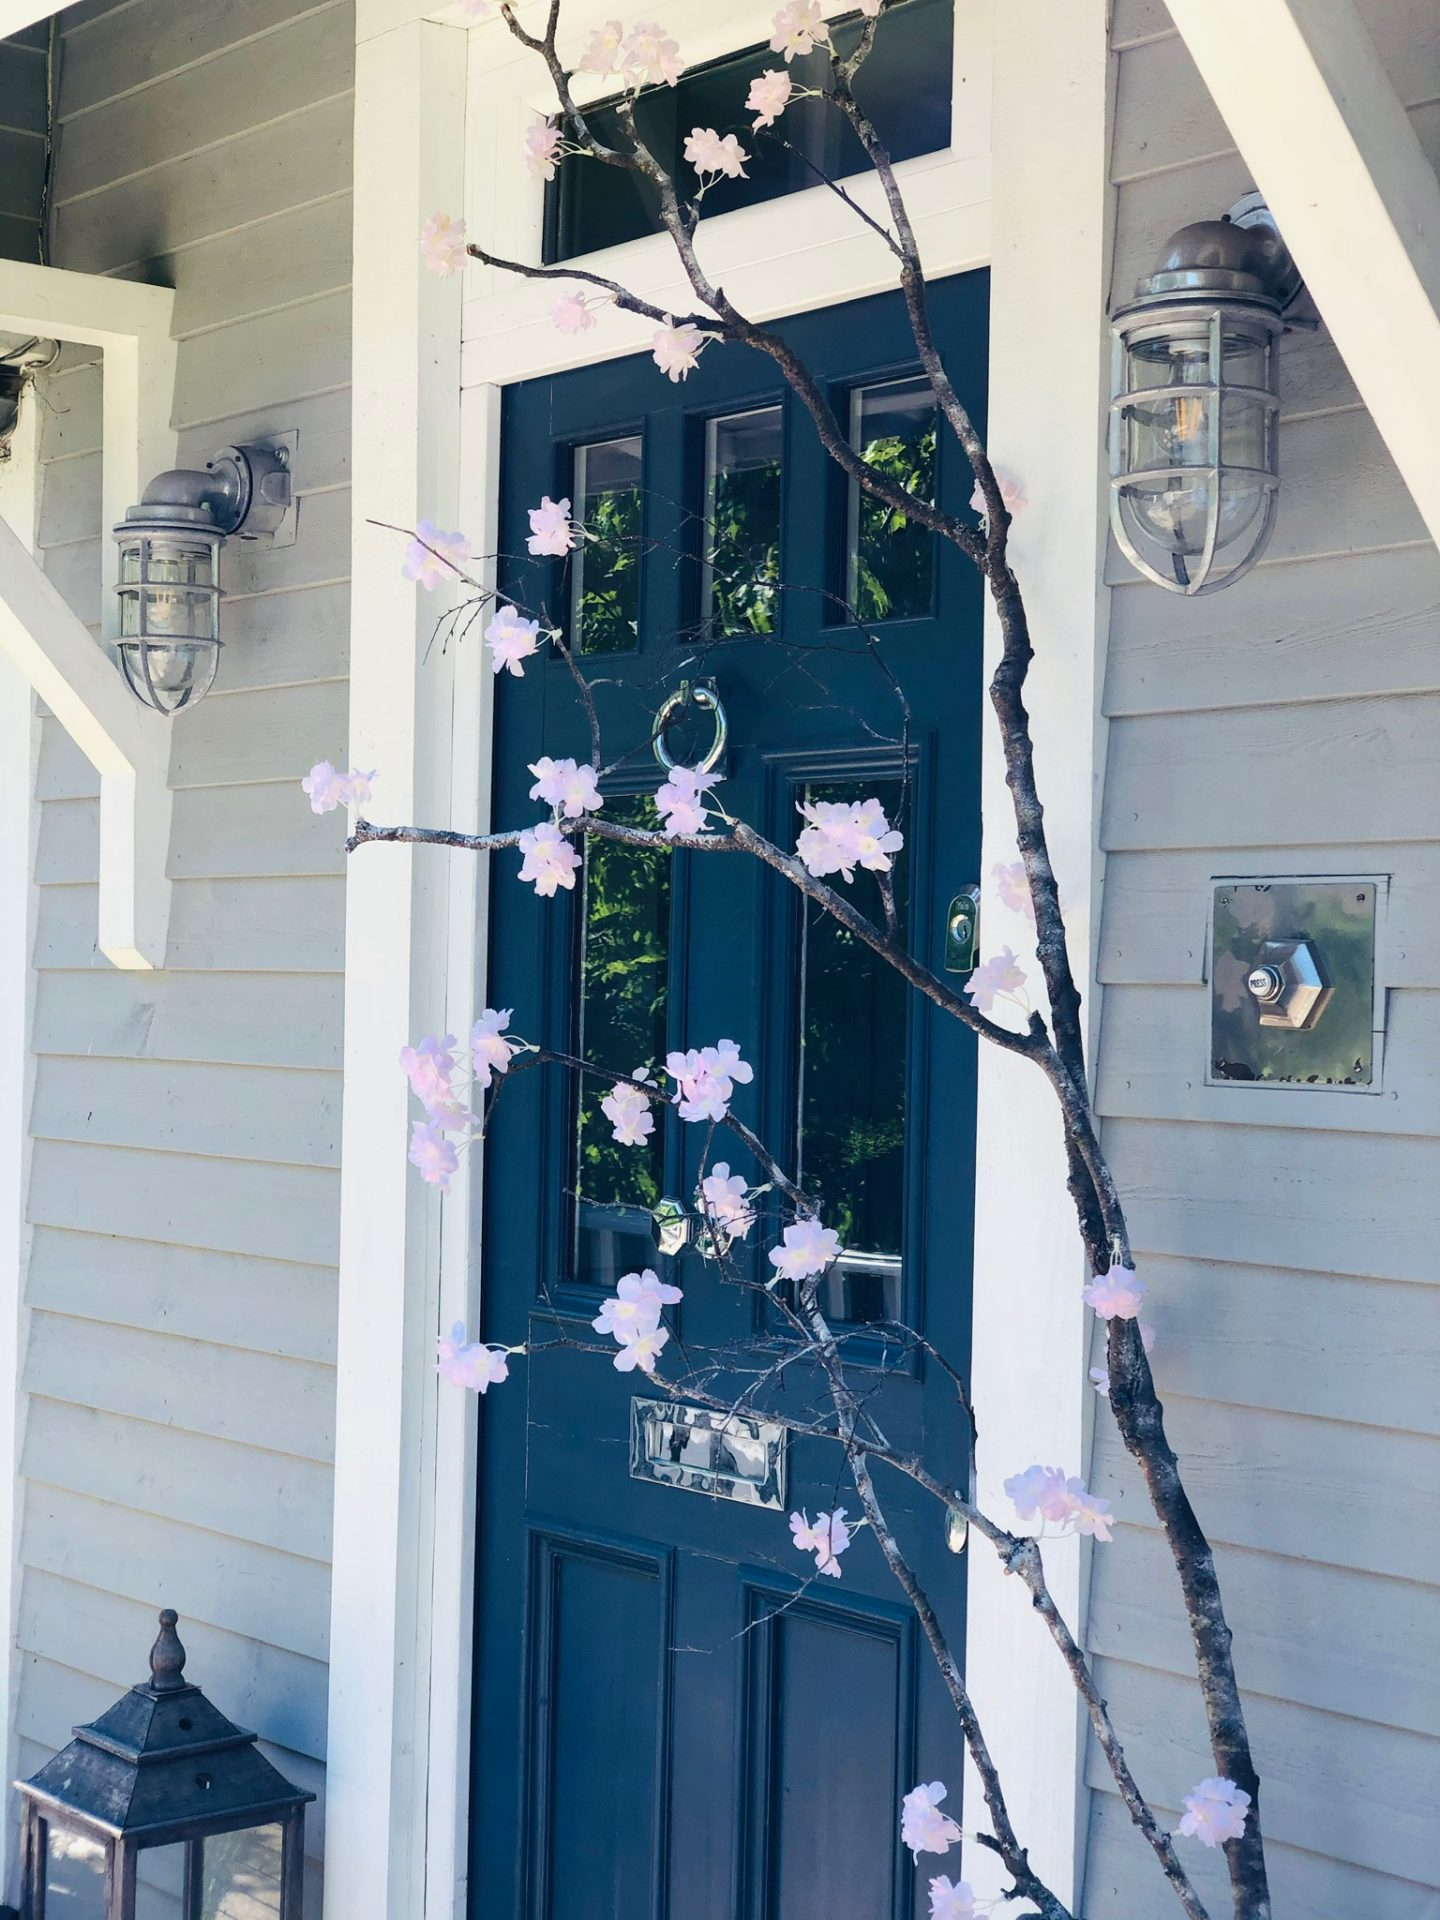 Faux cherry blossom branch made by JP Clark jpslifeandloves.com @jpslifeandloves